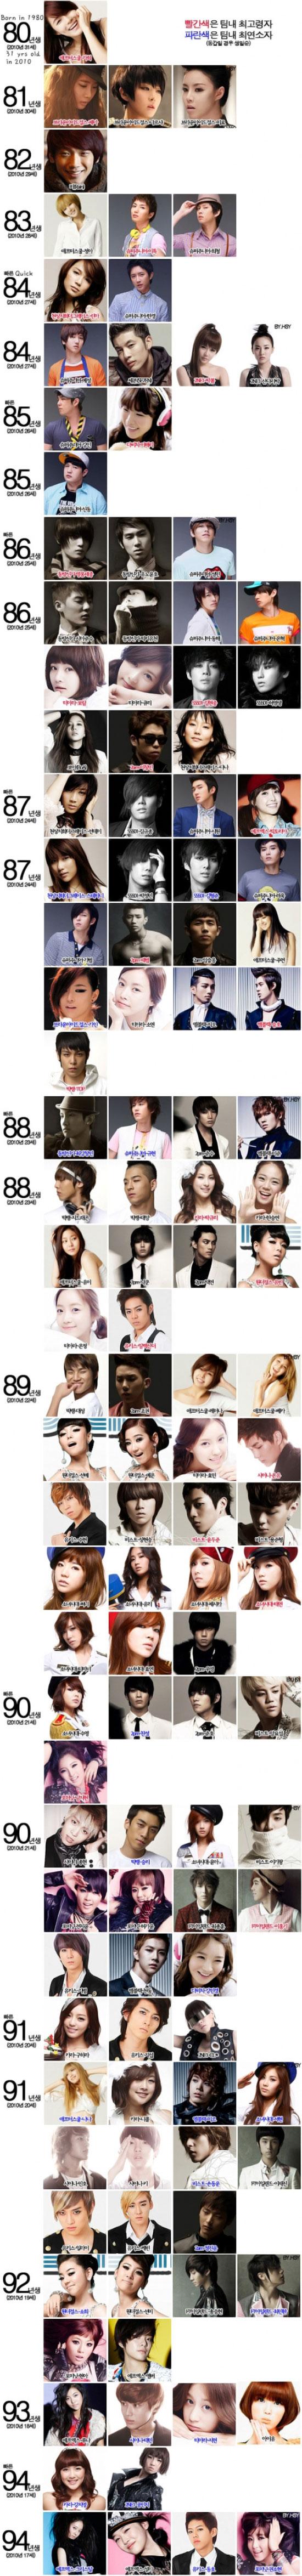 K-pop idols age chart